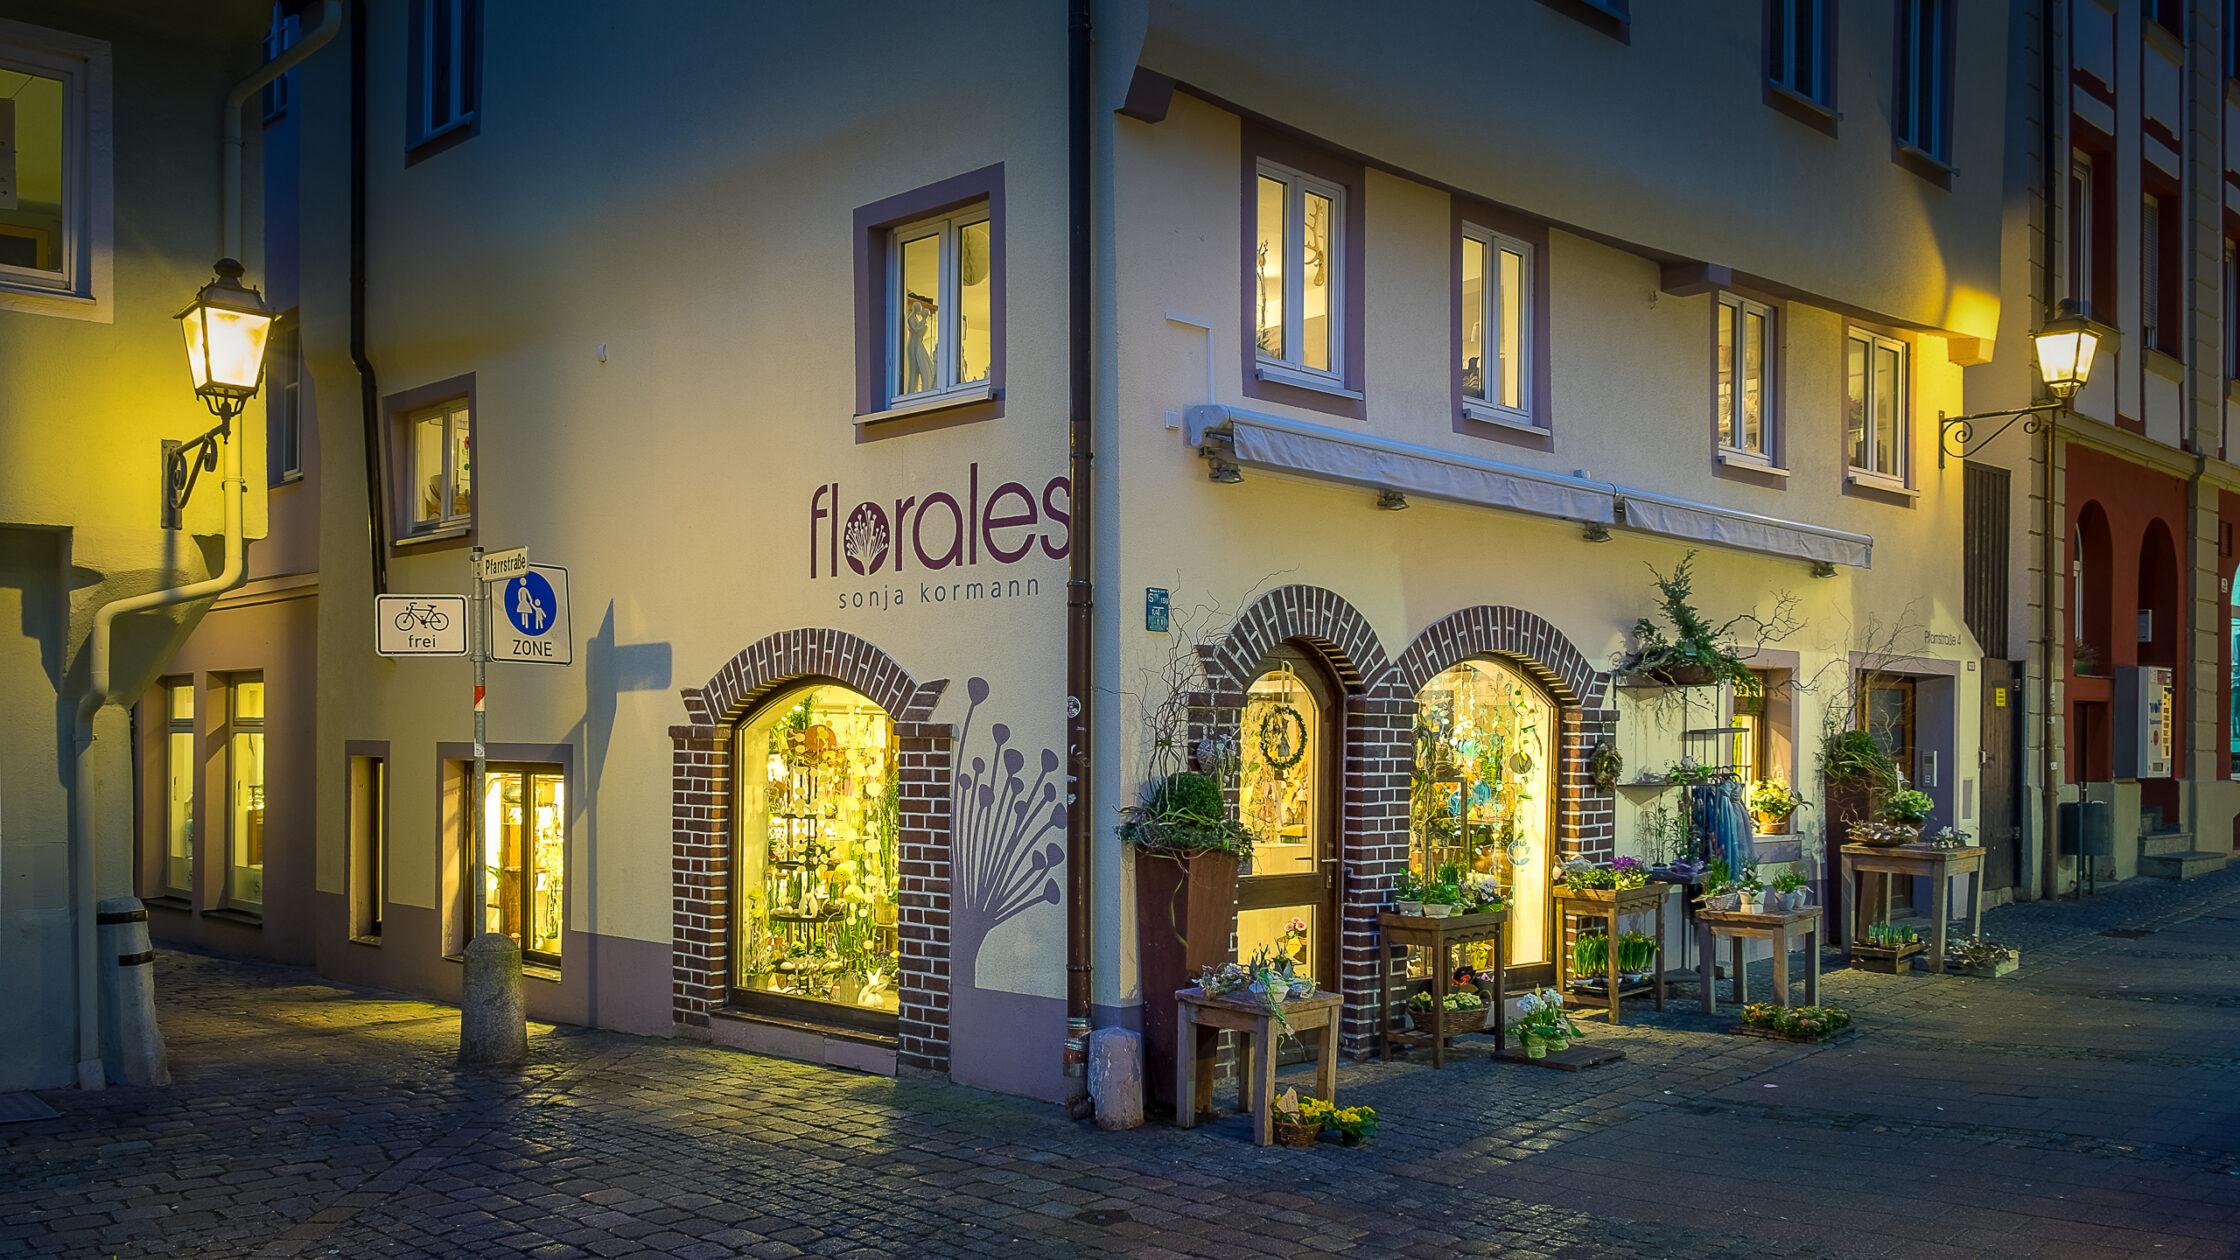 Florales Sonja Kormann Ansbach / 20170220175654